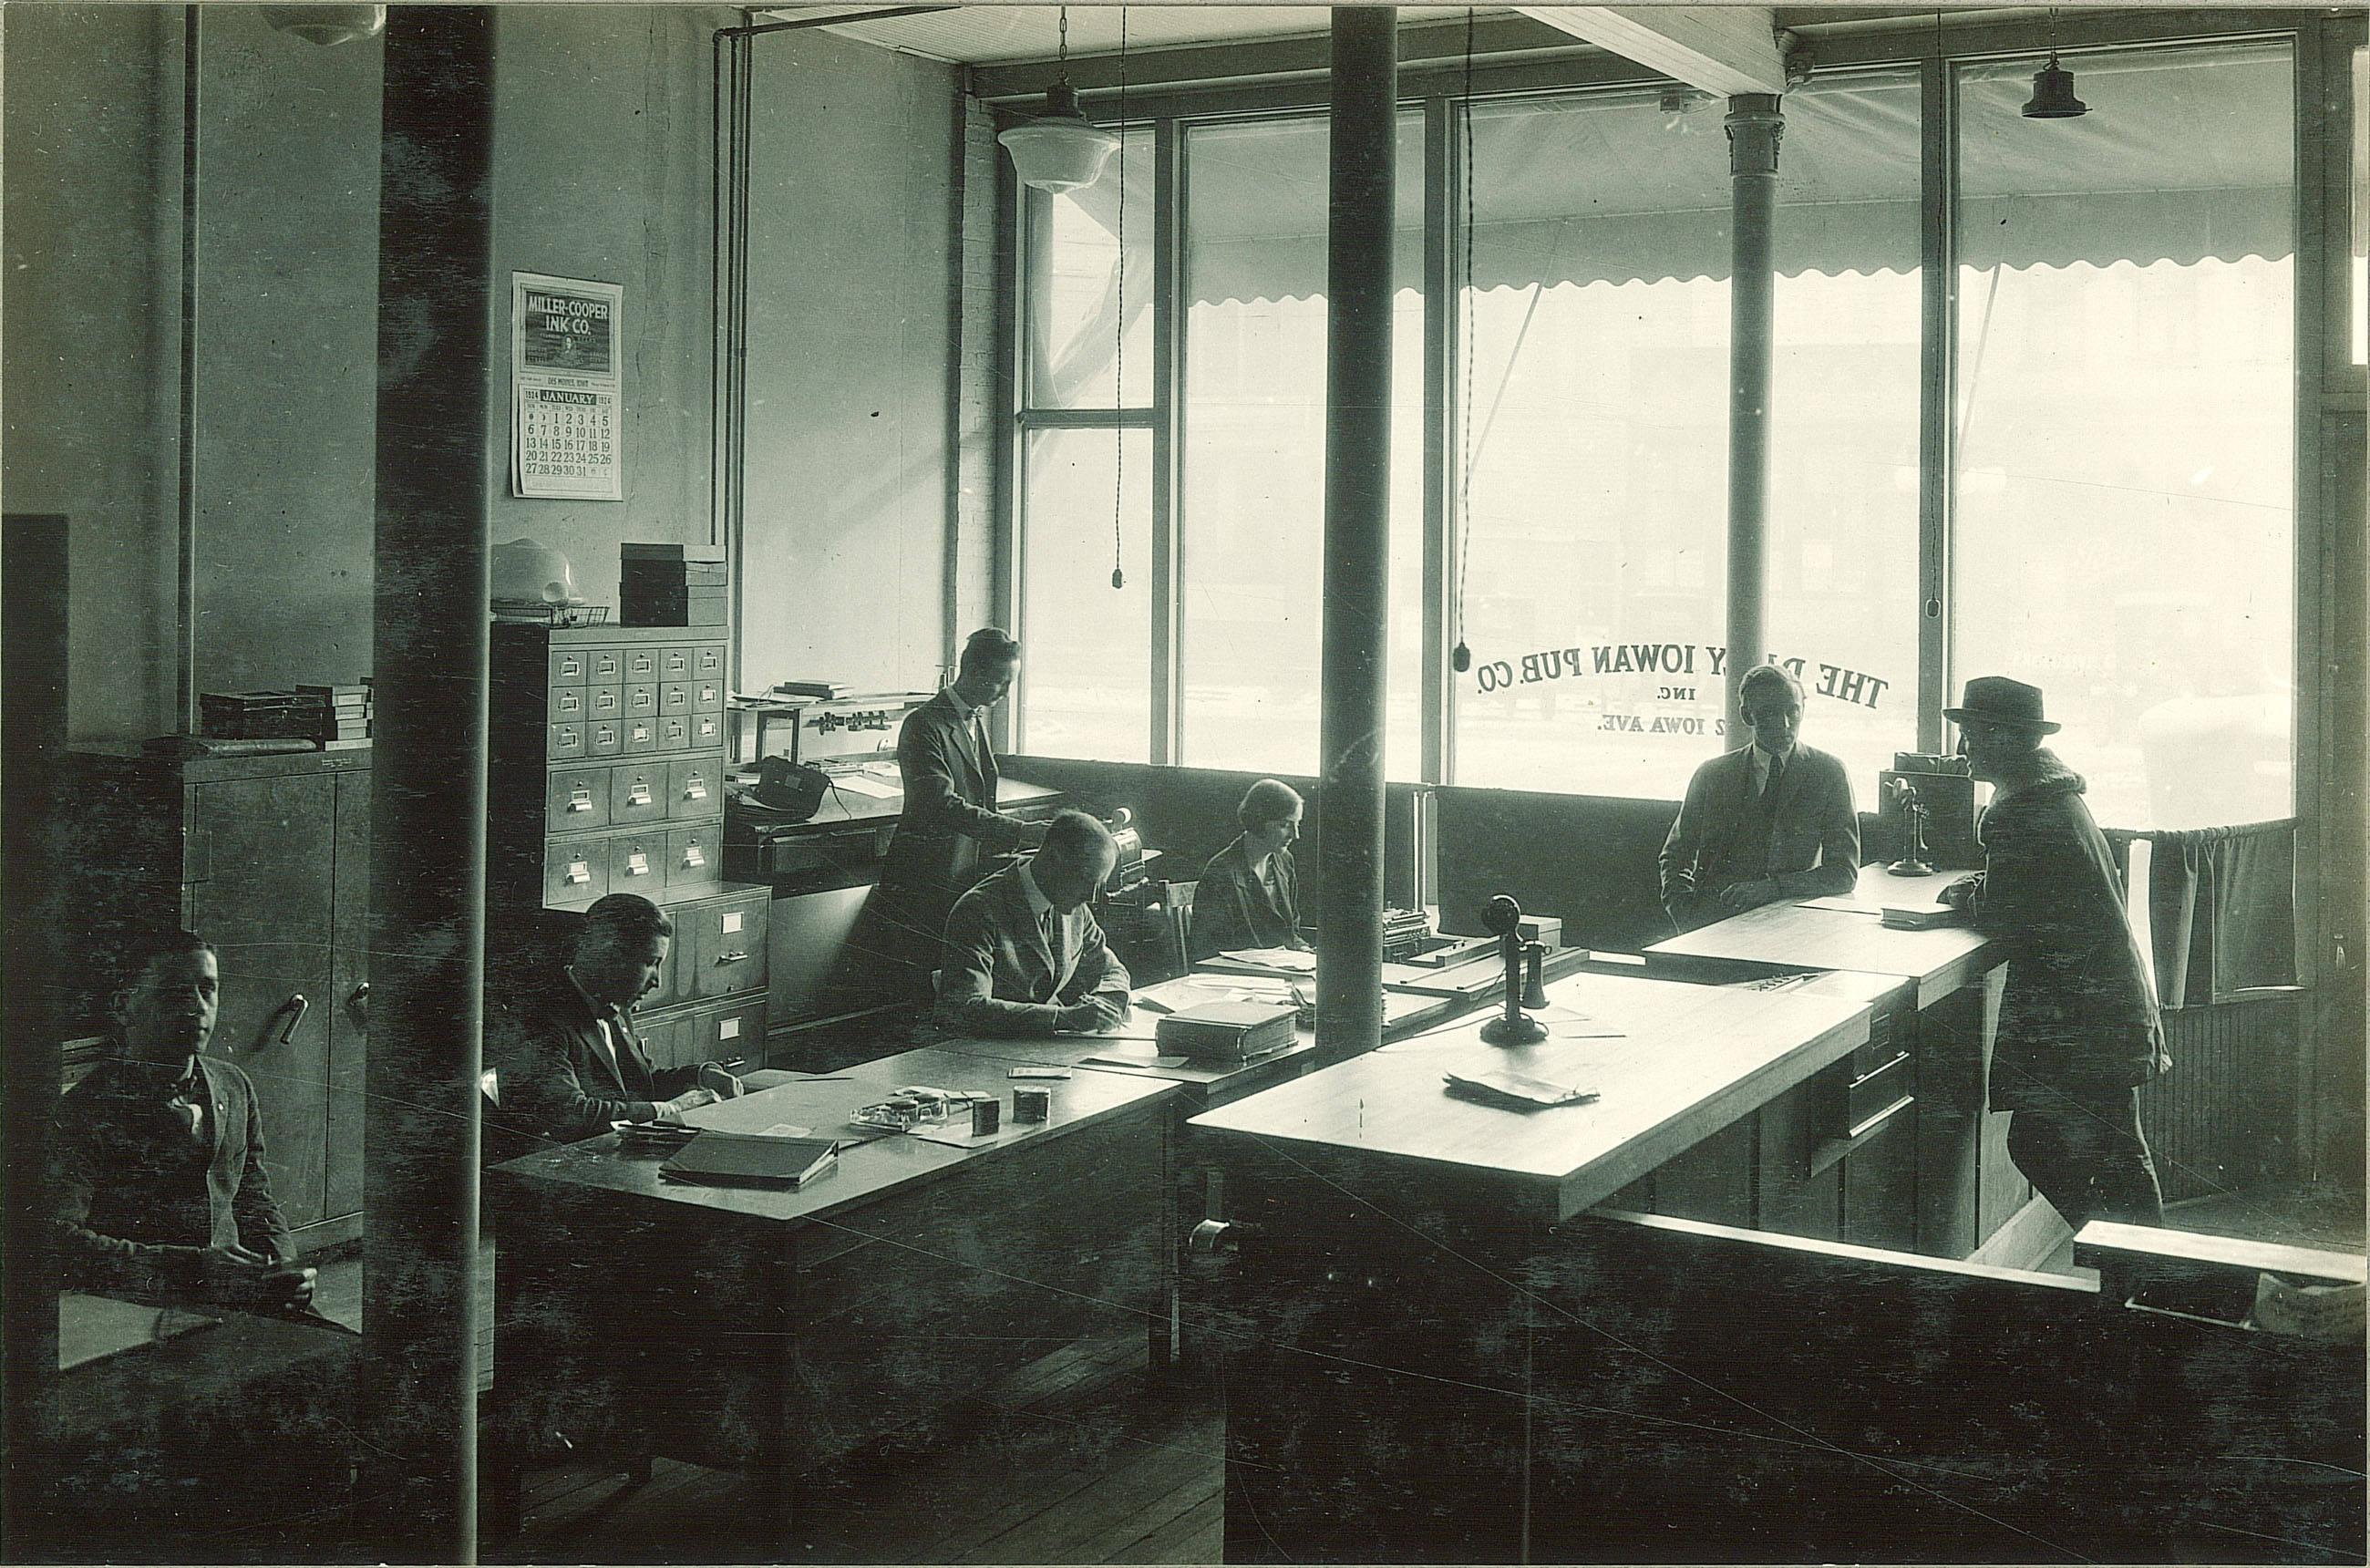 Daily Iowan Newspaper Office